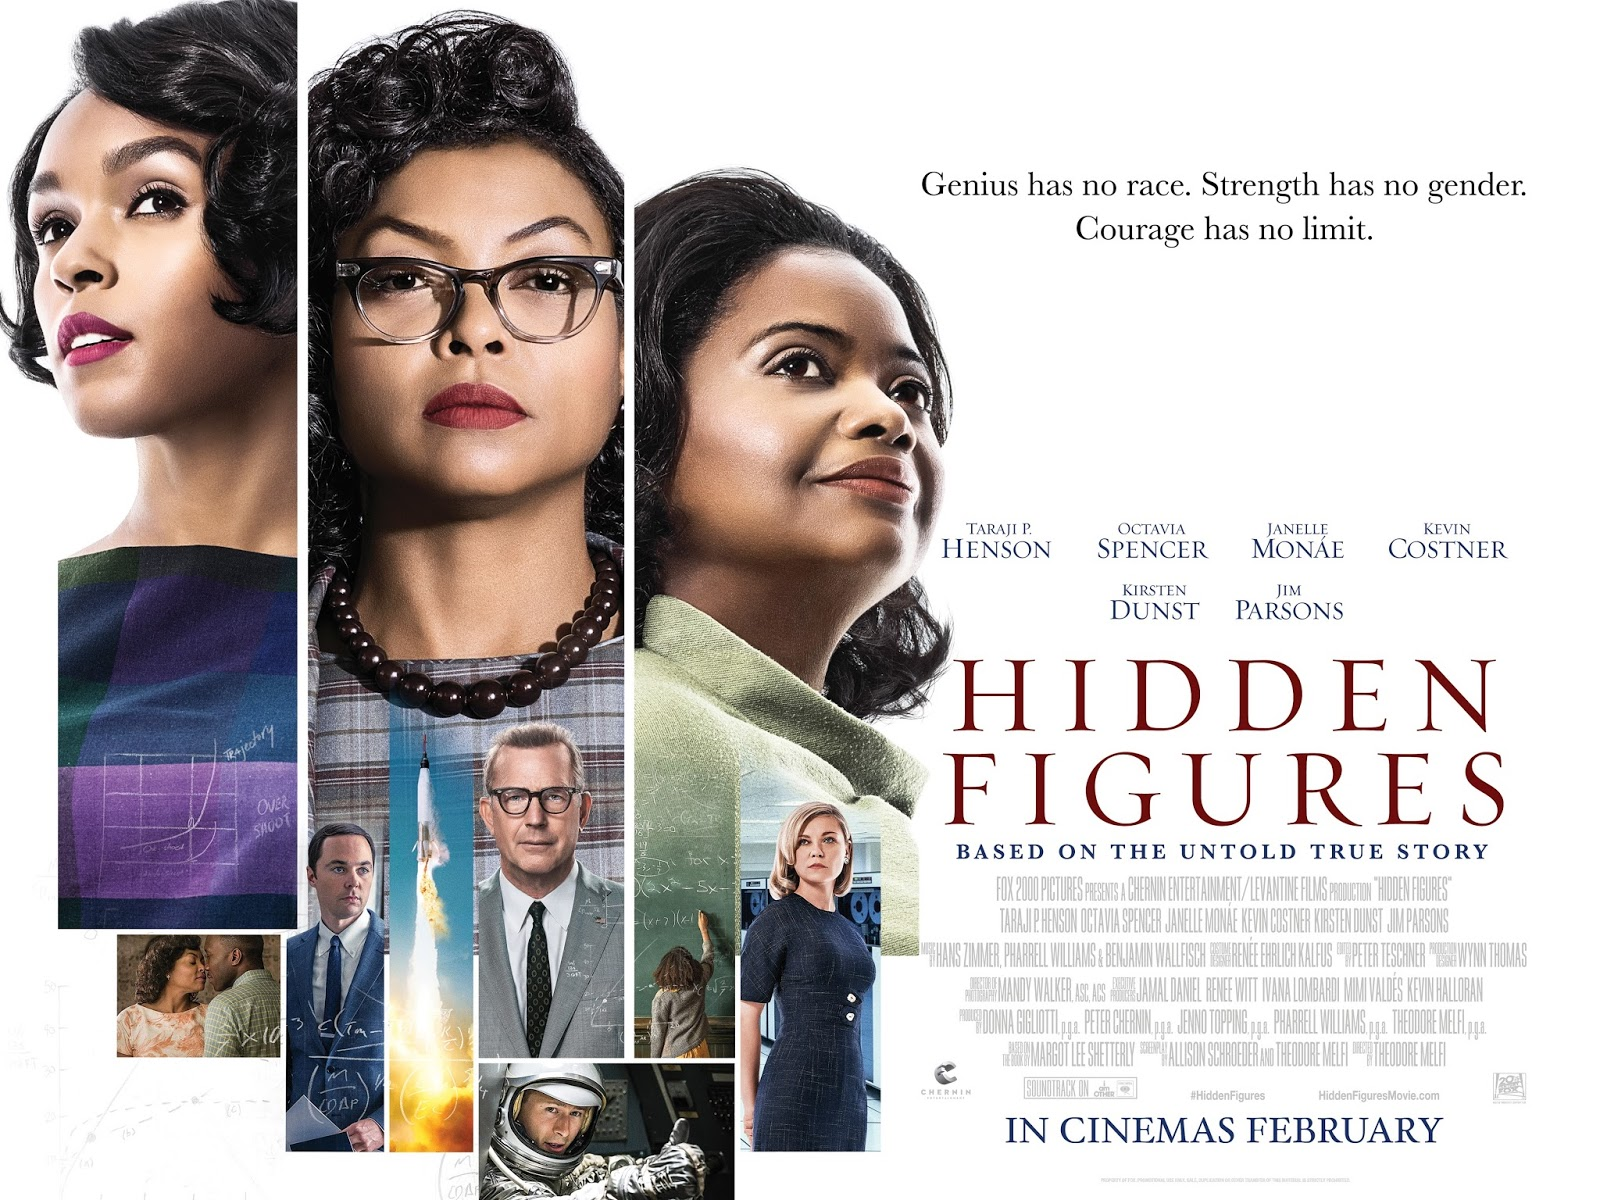 Been To The Movies: Hidden Figures - Brand New International Poster